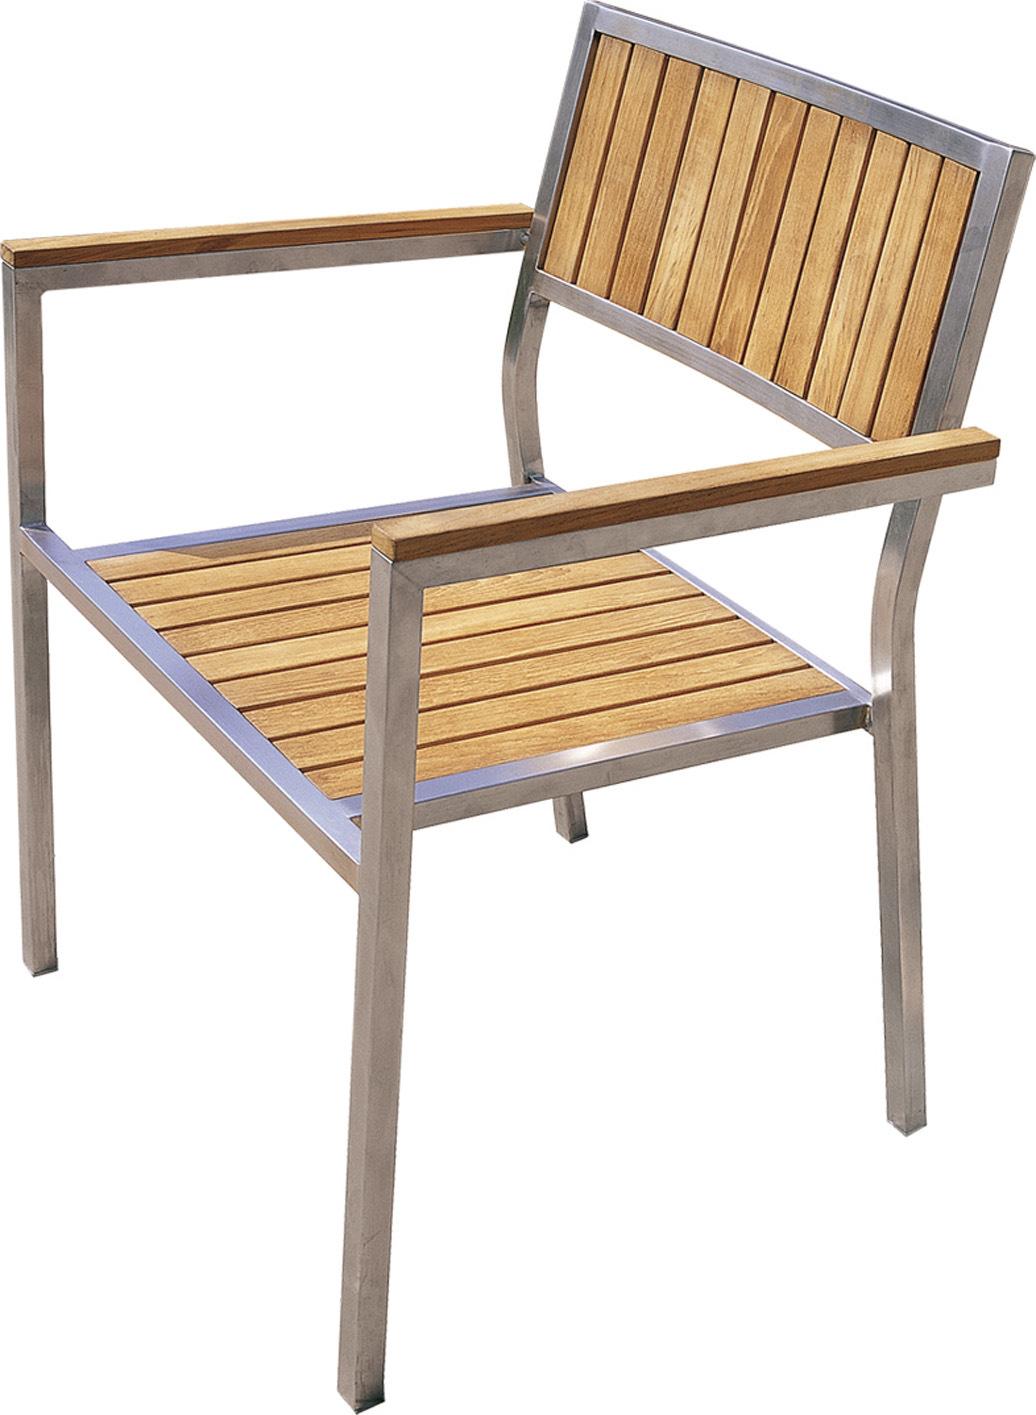 Garden Furniture Dubai Hot Sale Teak Wood Dining Set